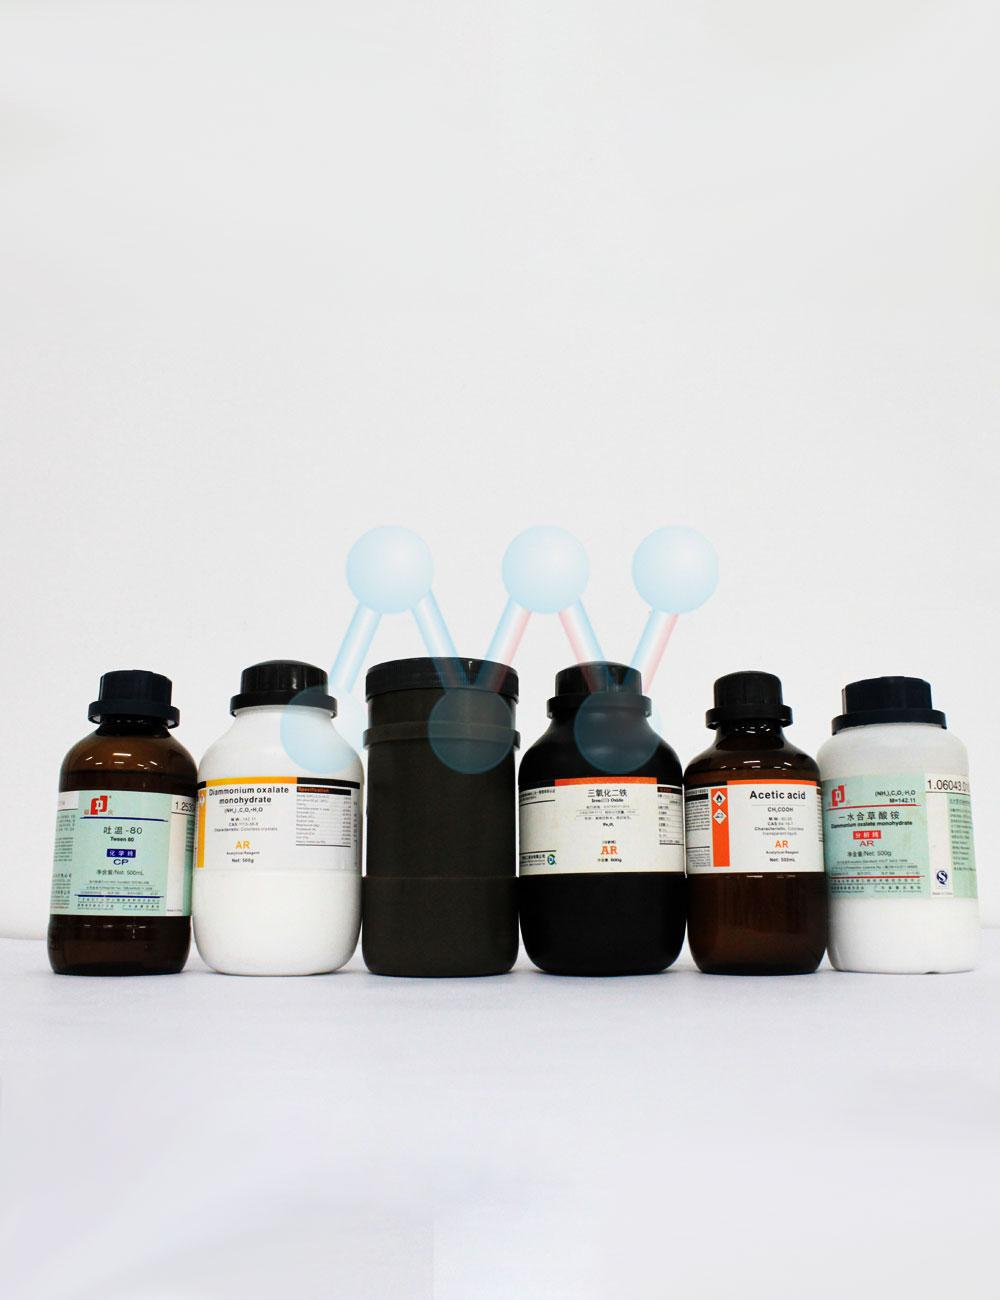 n-Butanol C4H10O